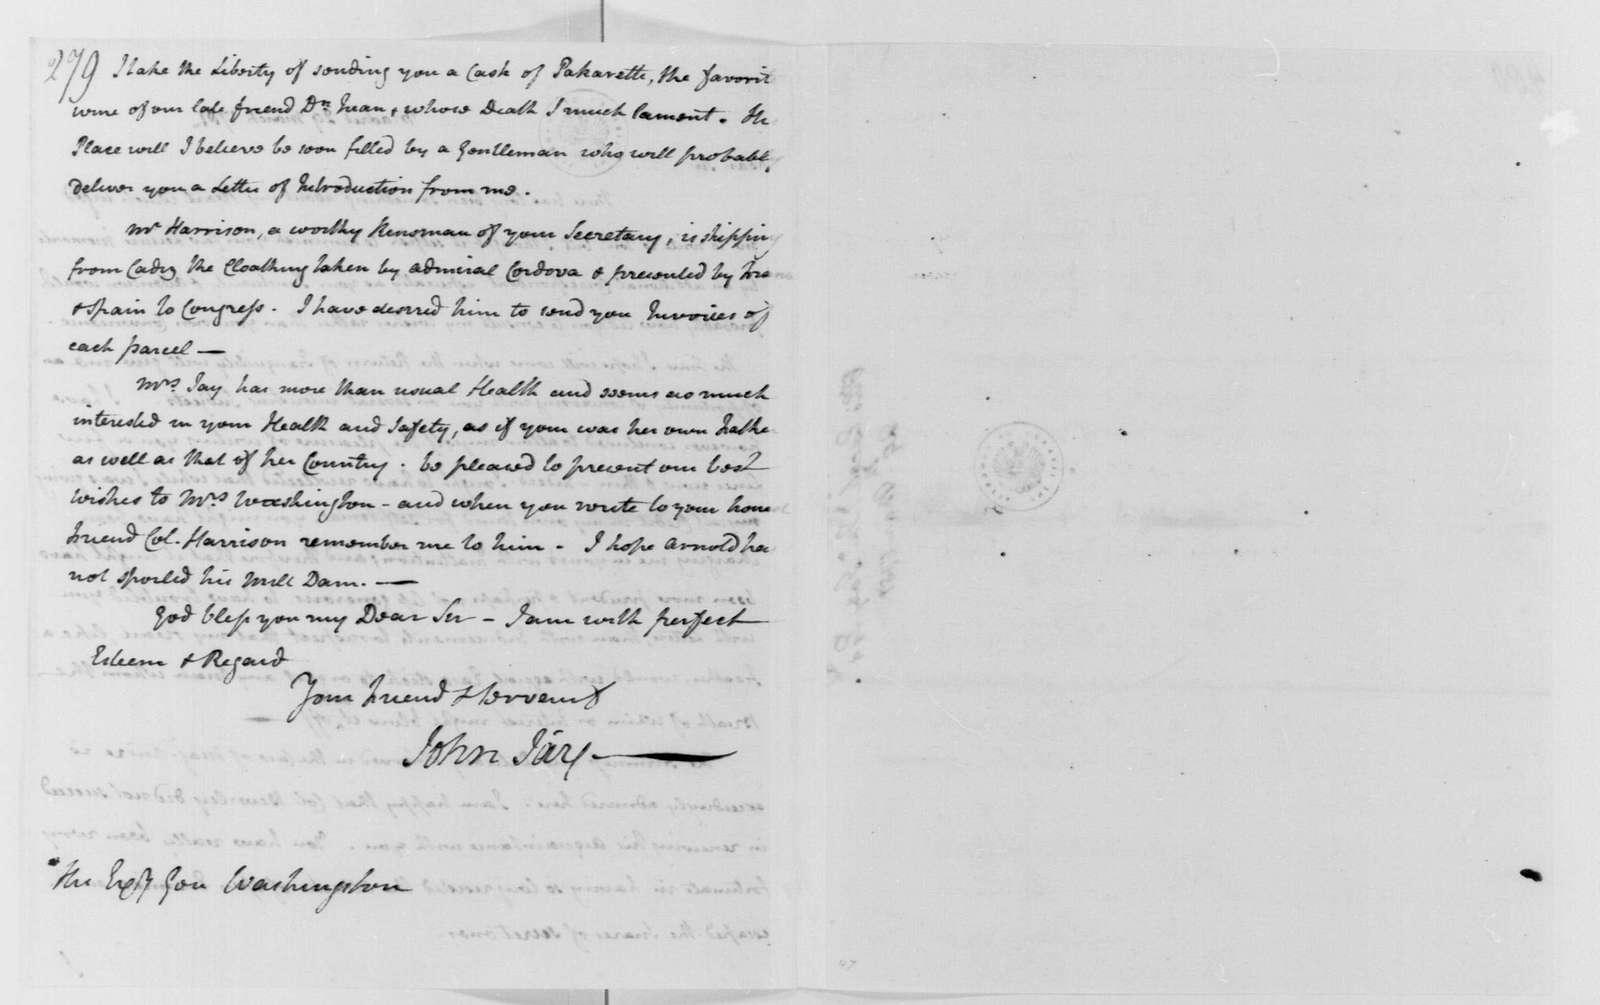 George Washington Papers, Series 4, General Correspondence: John Jay to George Washington, March 29, 1781